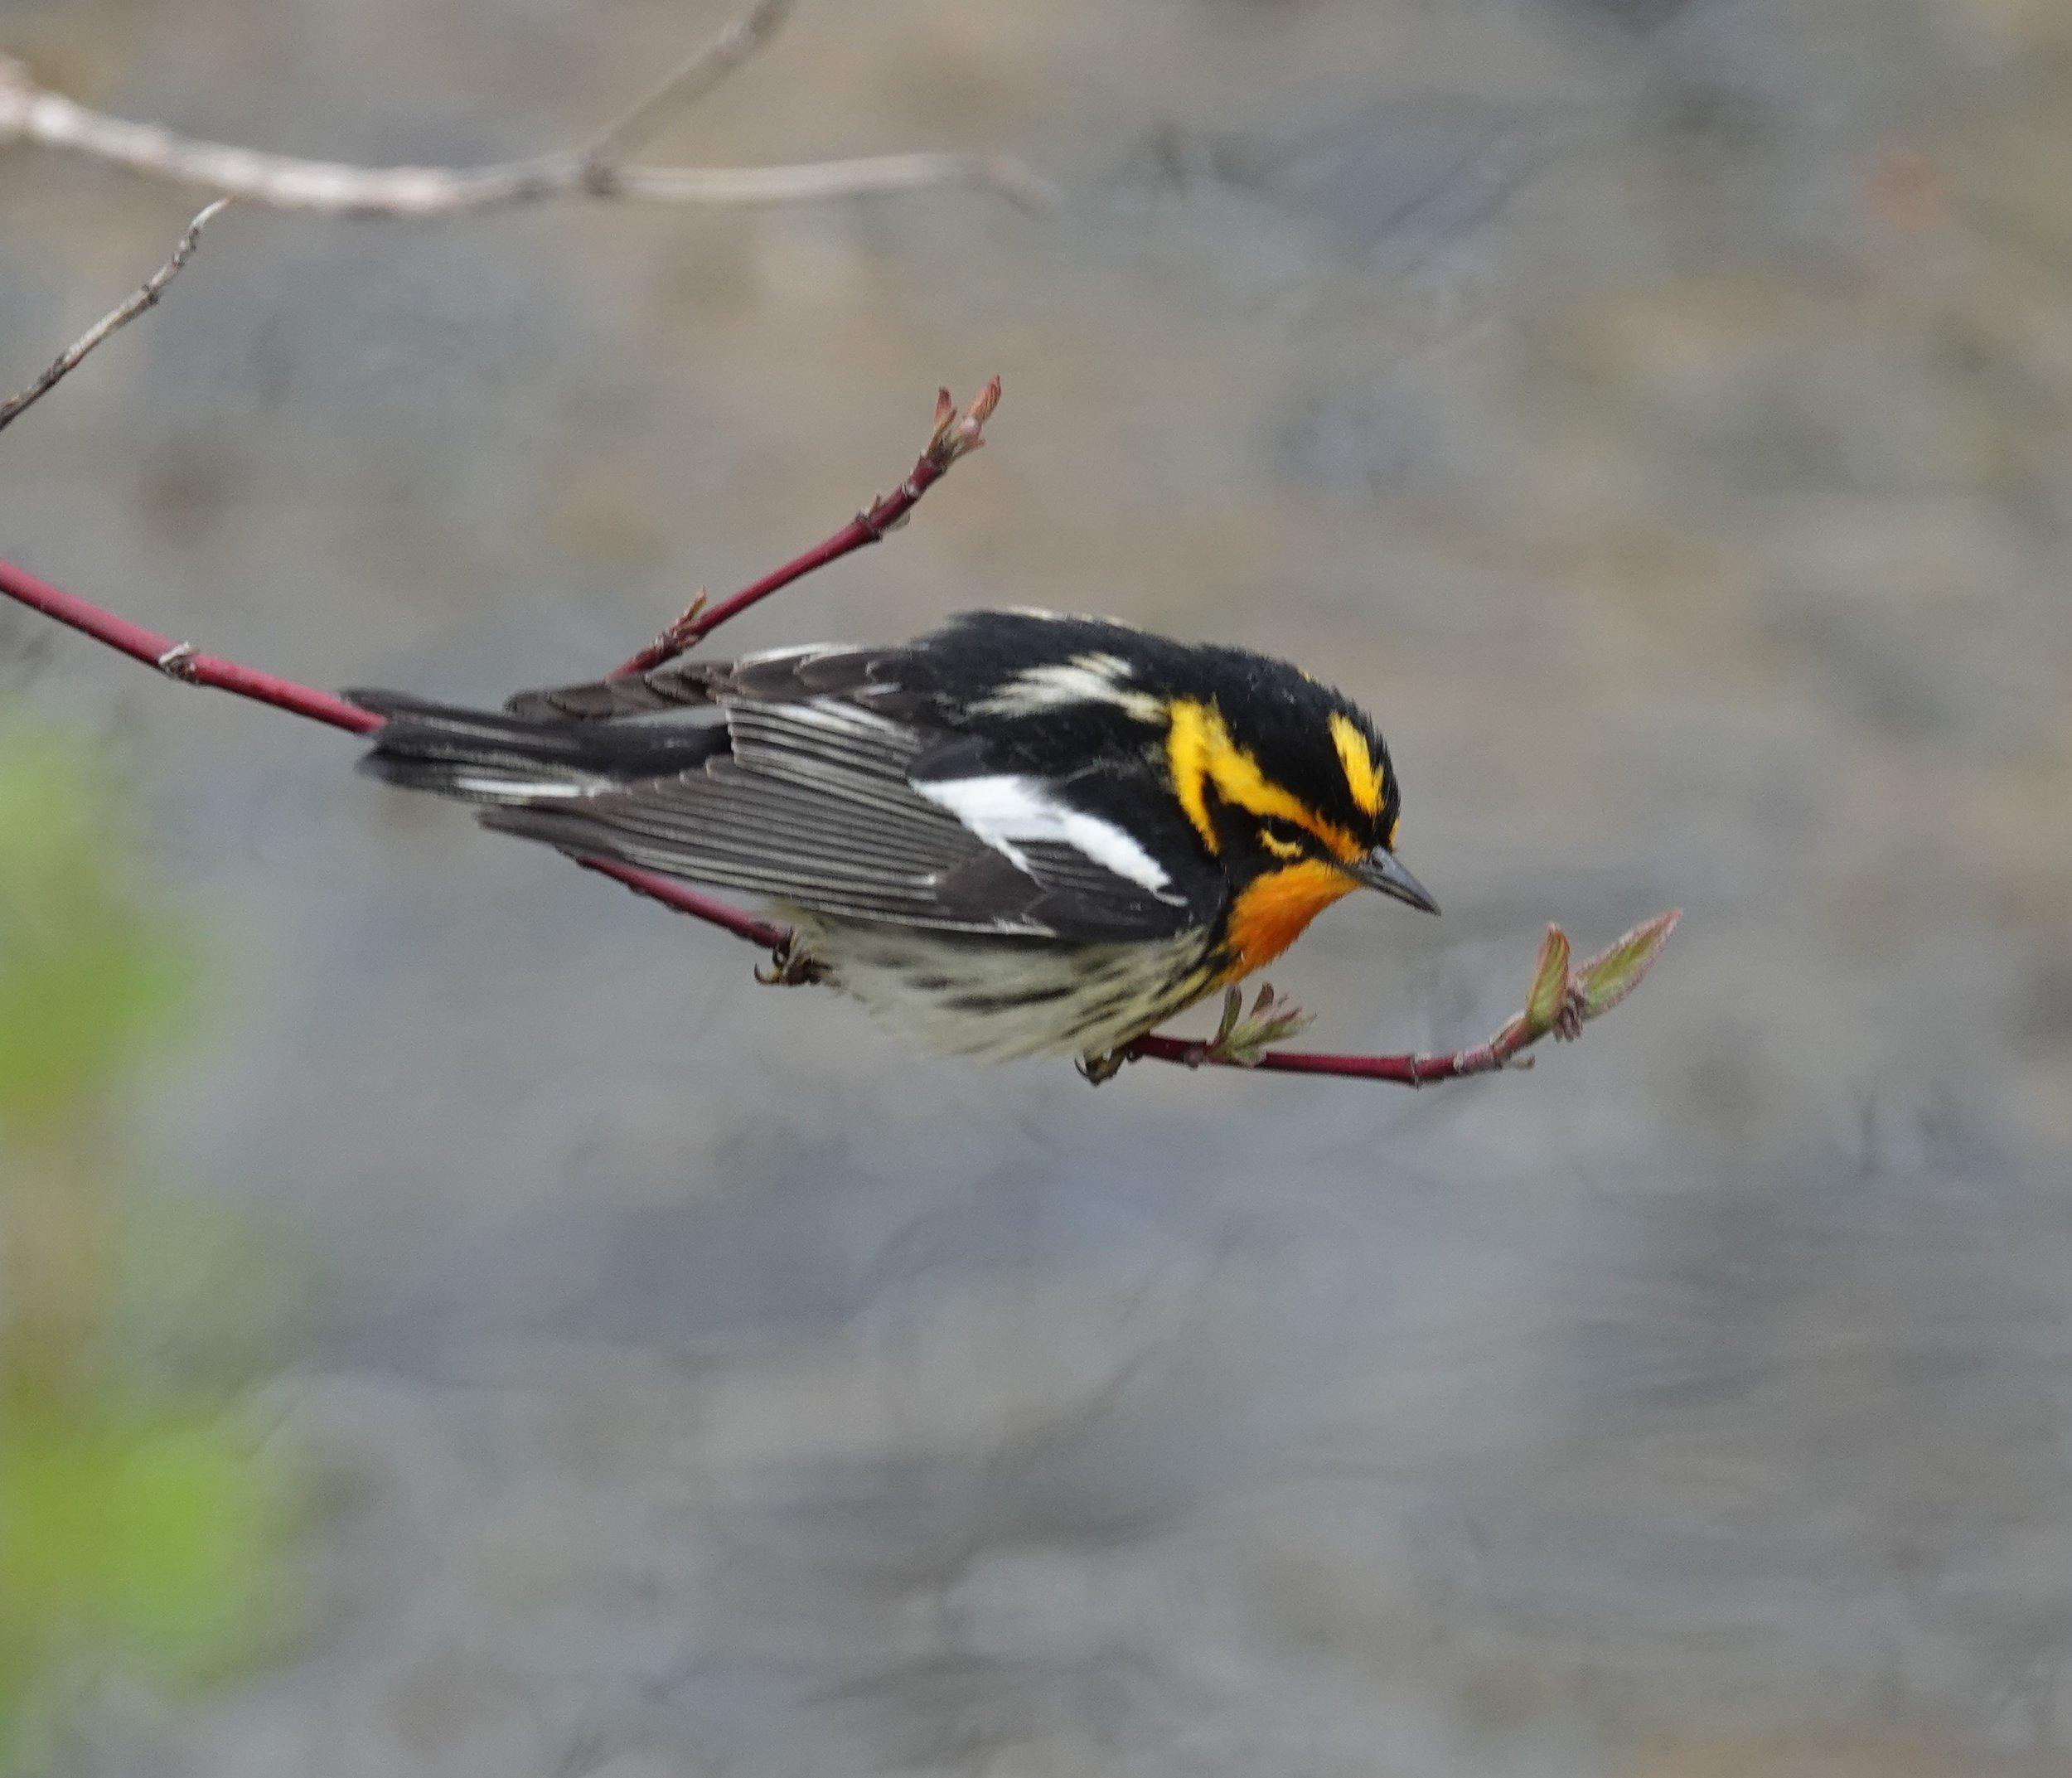 The Blackburnian warbler was named after the botanist Anna Blackburne.  The baseball team could have been named the Baltimore Blackburnians.